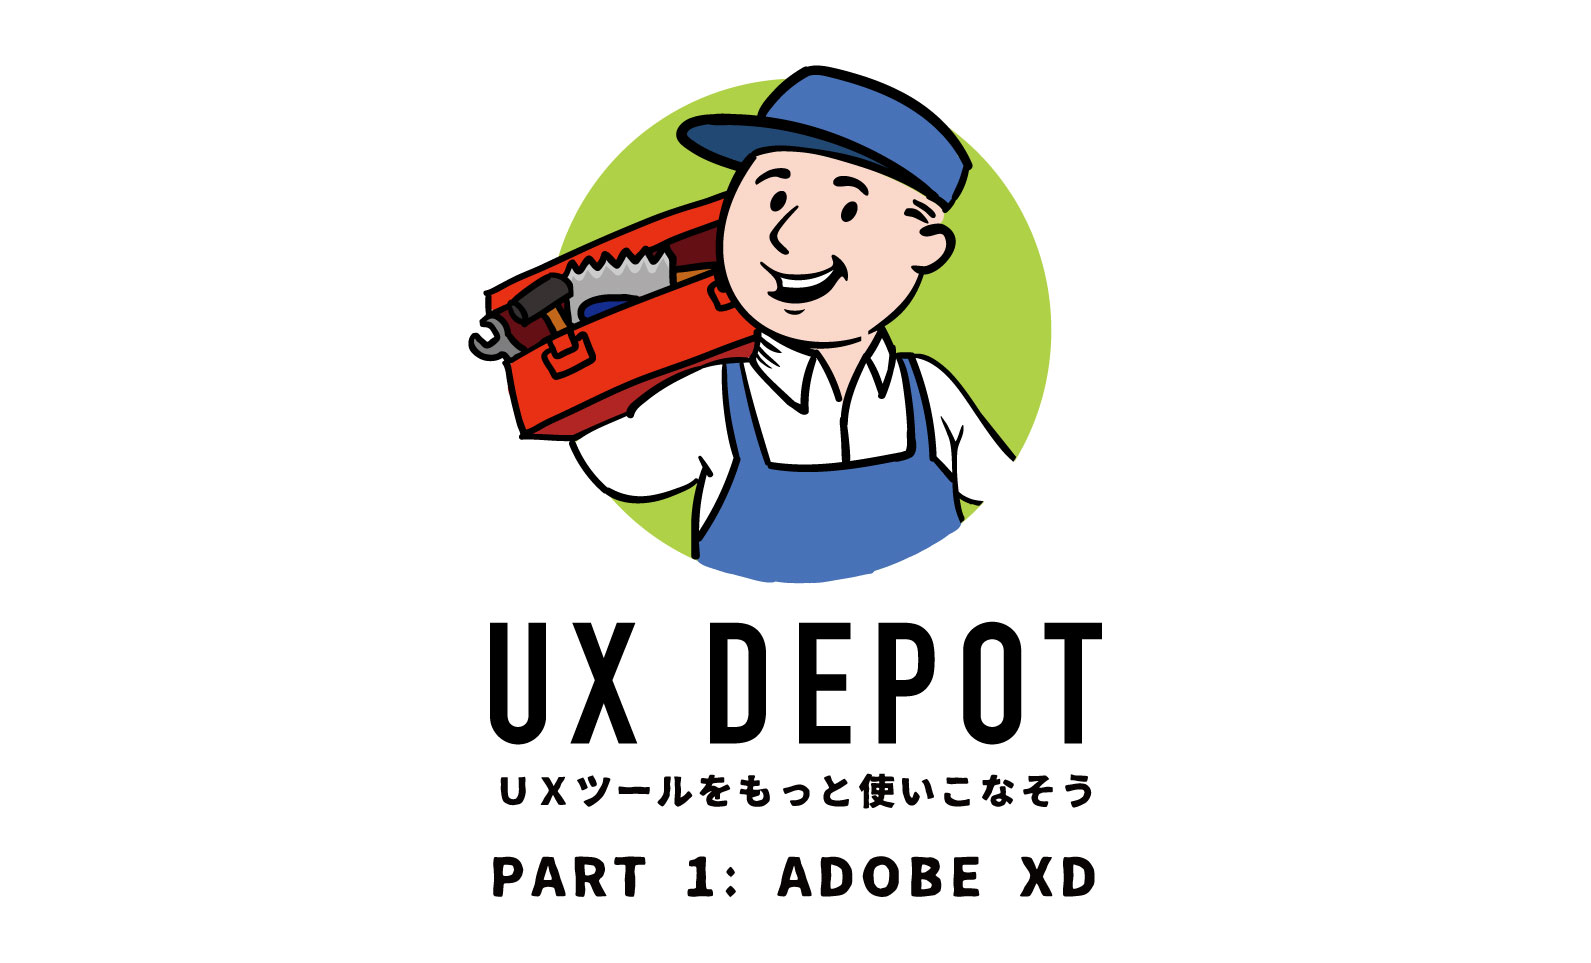 uxdepot_logo